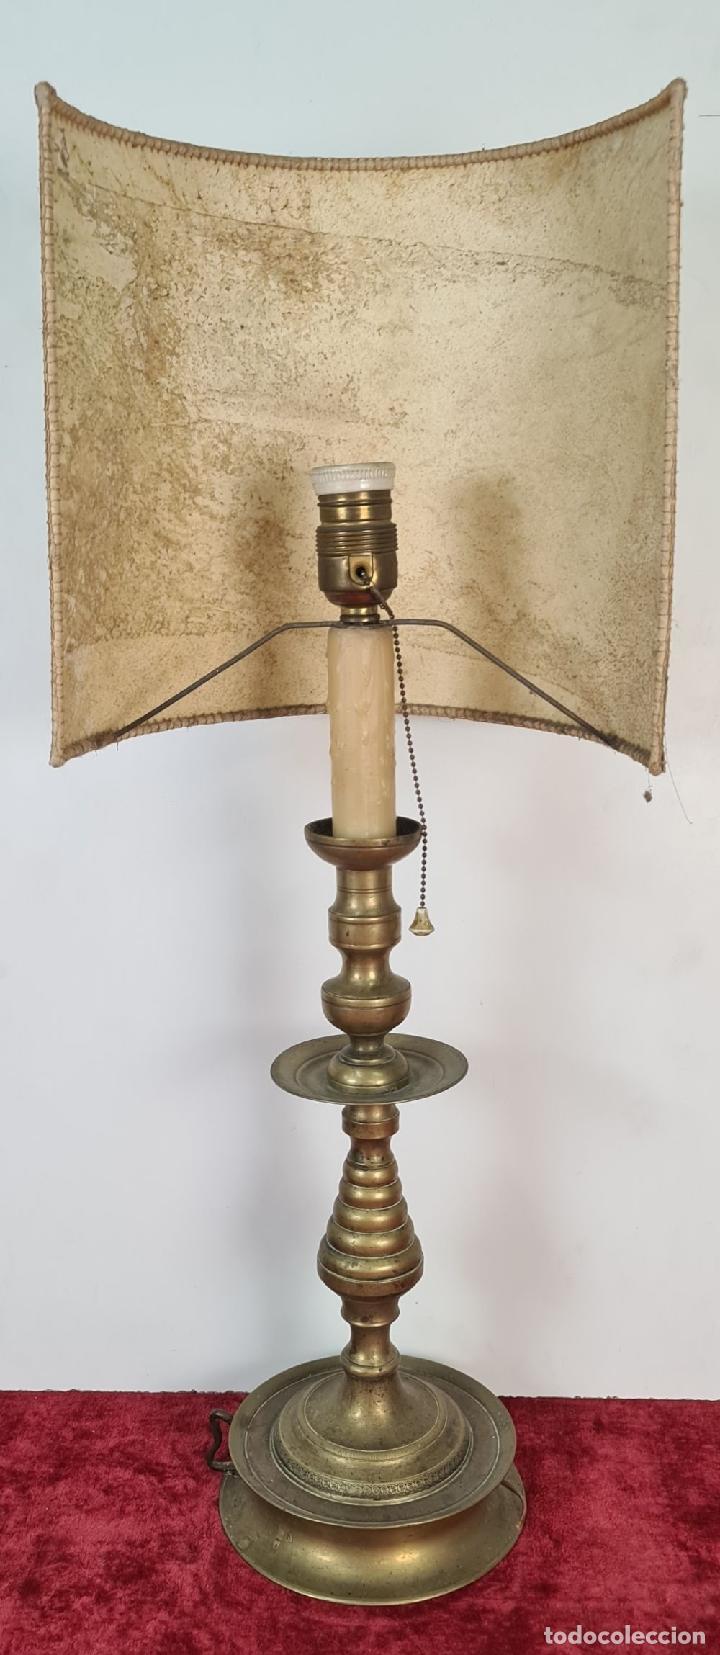 Antigüedades: LÁMPARA DE SOBREMESA EN LATÓN. PANTALLA DE PIEL PERGAMINO. CIRCA 1930. - Foto 9 - 211396306